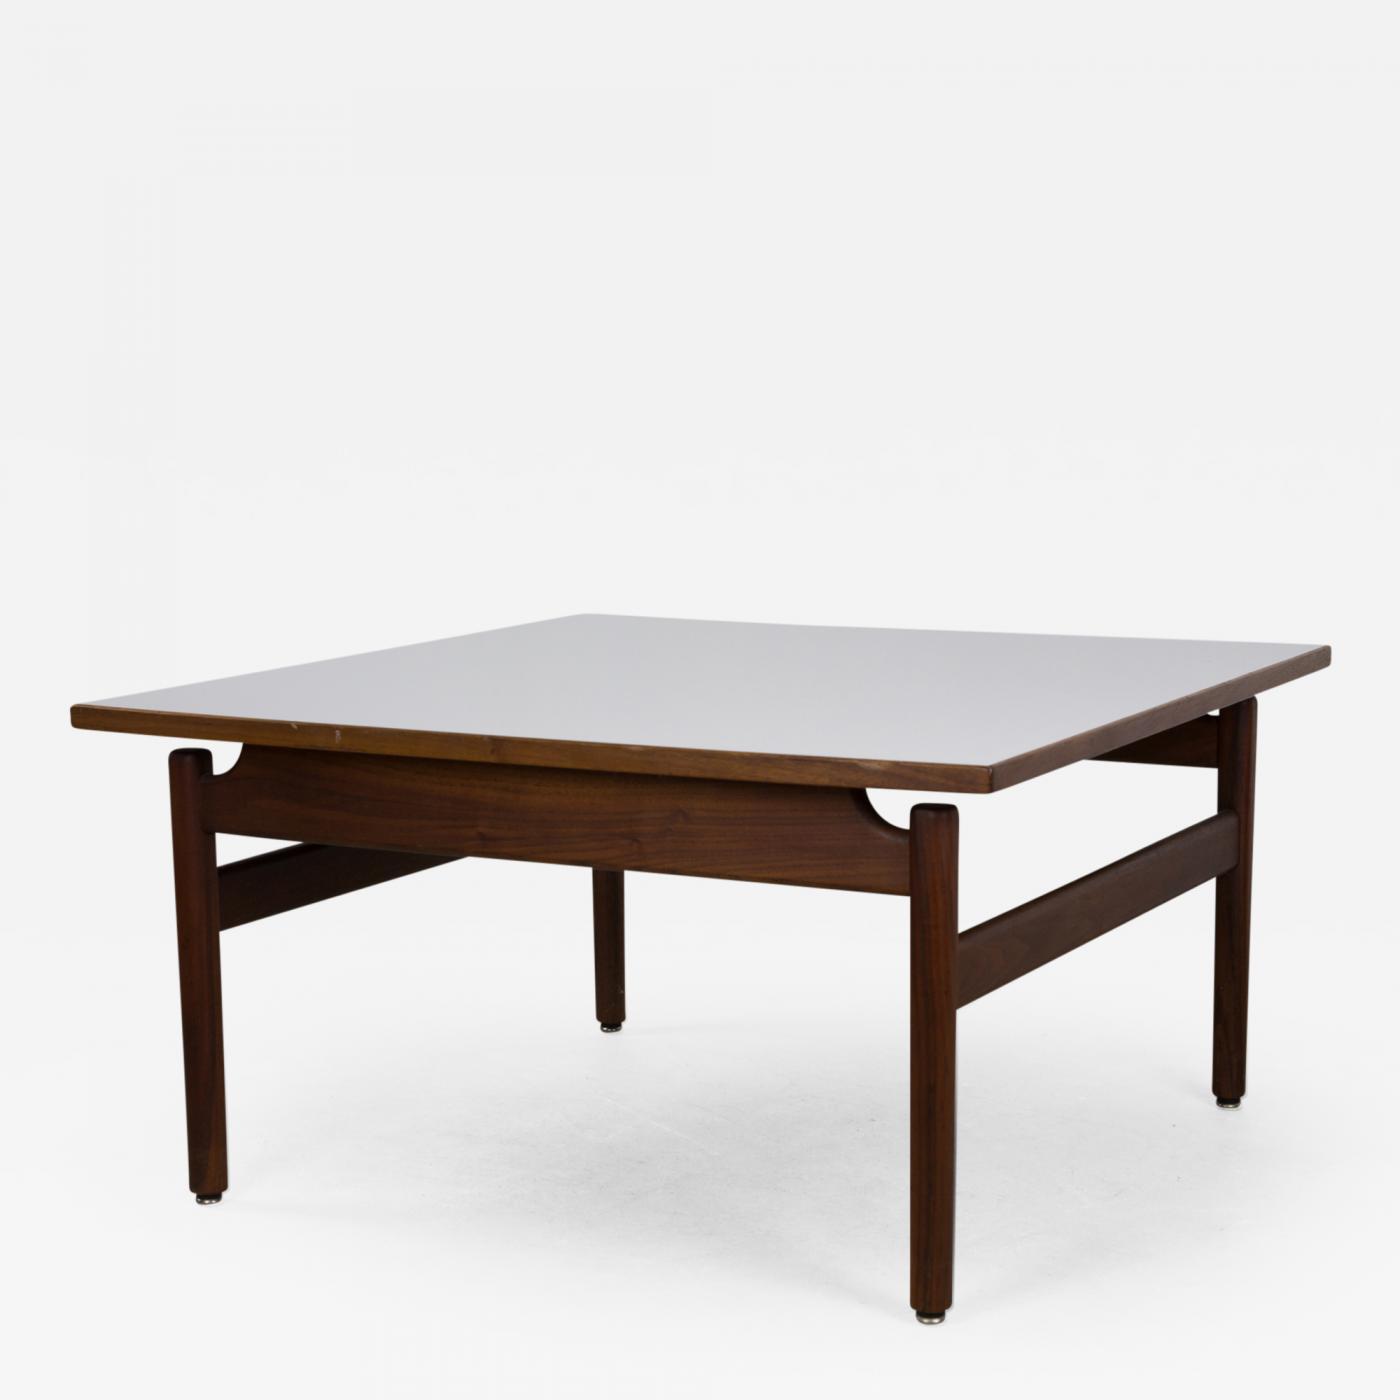 Jens Risom Jens Risom Walnut And Laminate Coffee Table